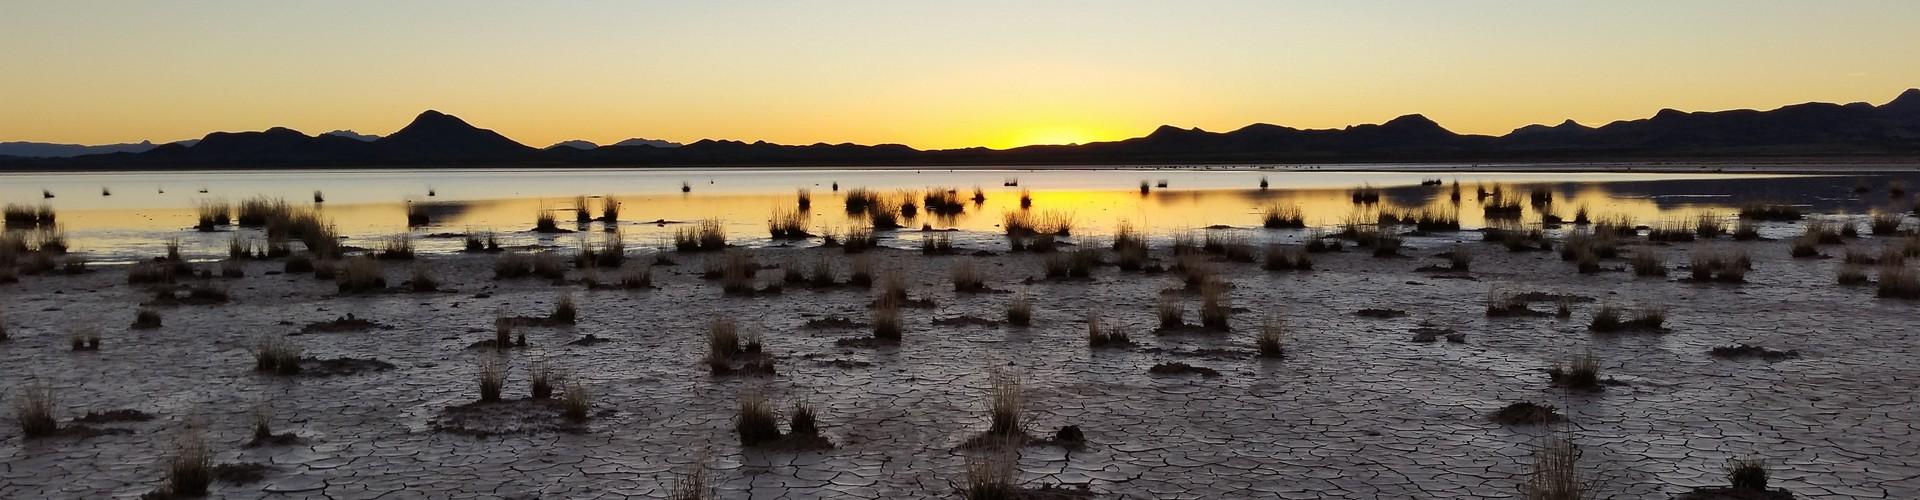 Lordsburg Playa, New Mexico, USA (Credit: Martina Klose (distributed via imaggeo.egu.eu))